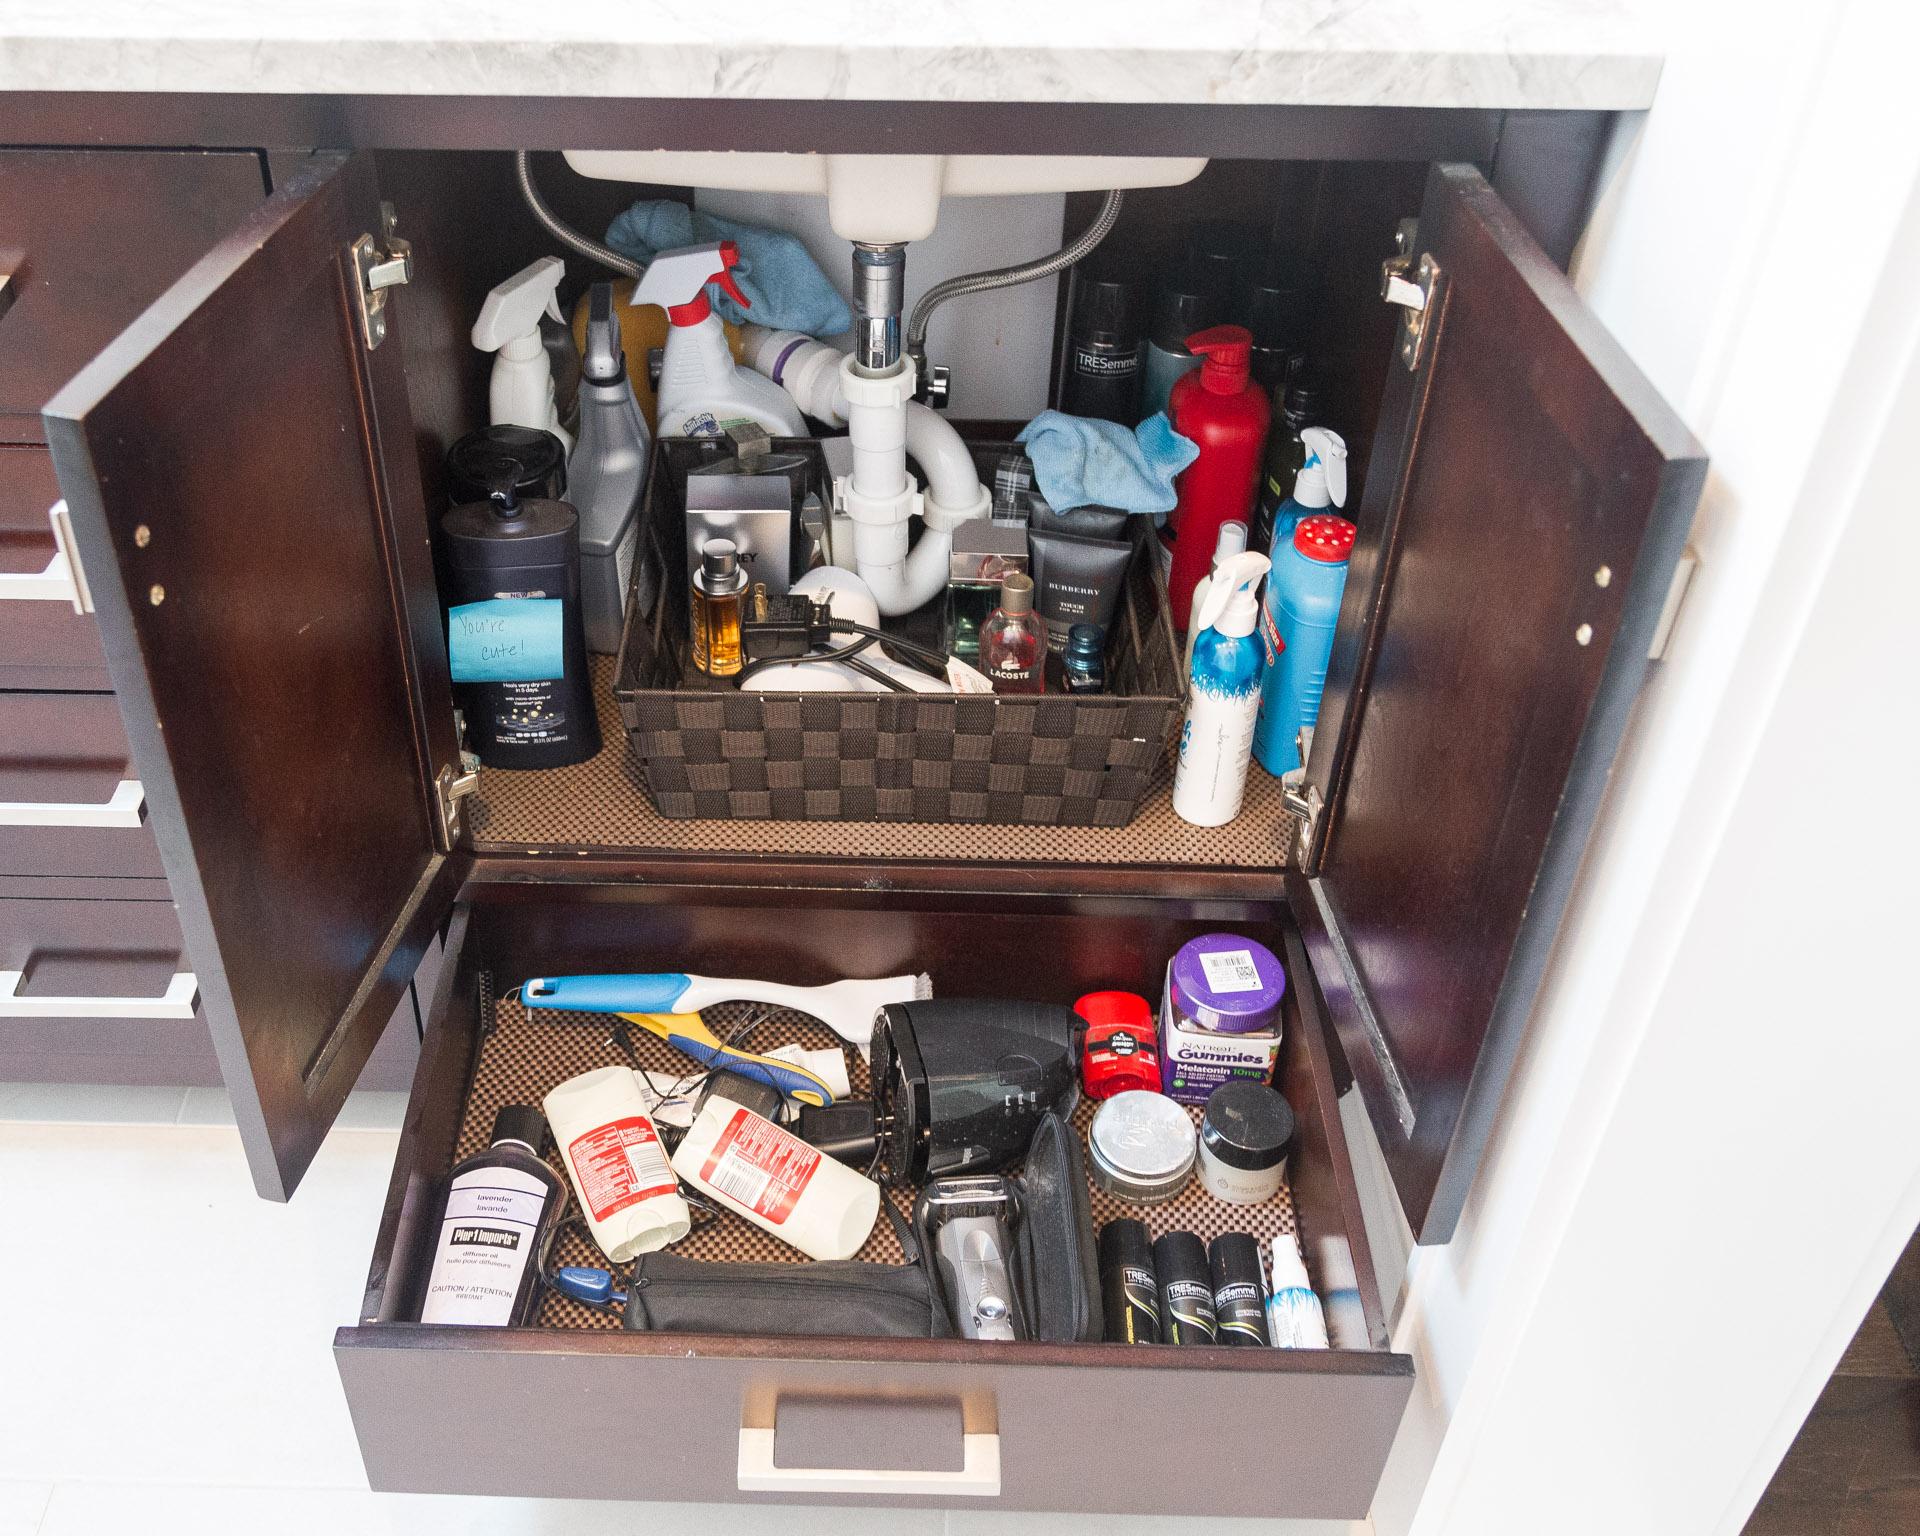 bathroom-organization-under-sink-2-before-the-glamorous-gal